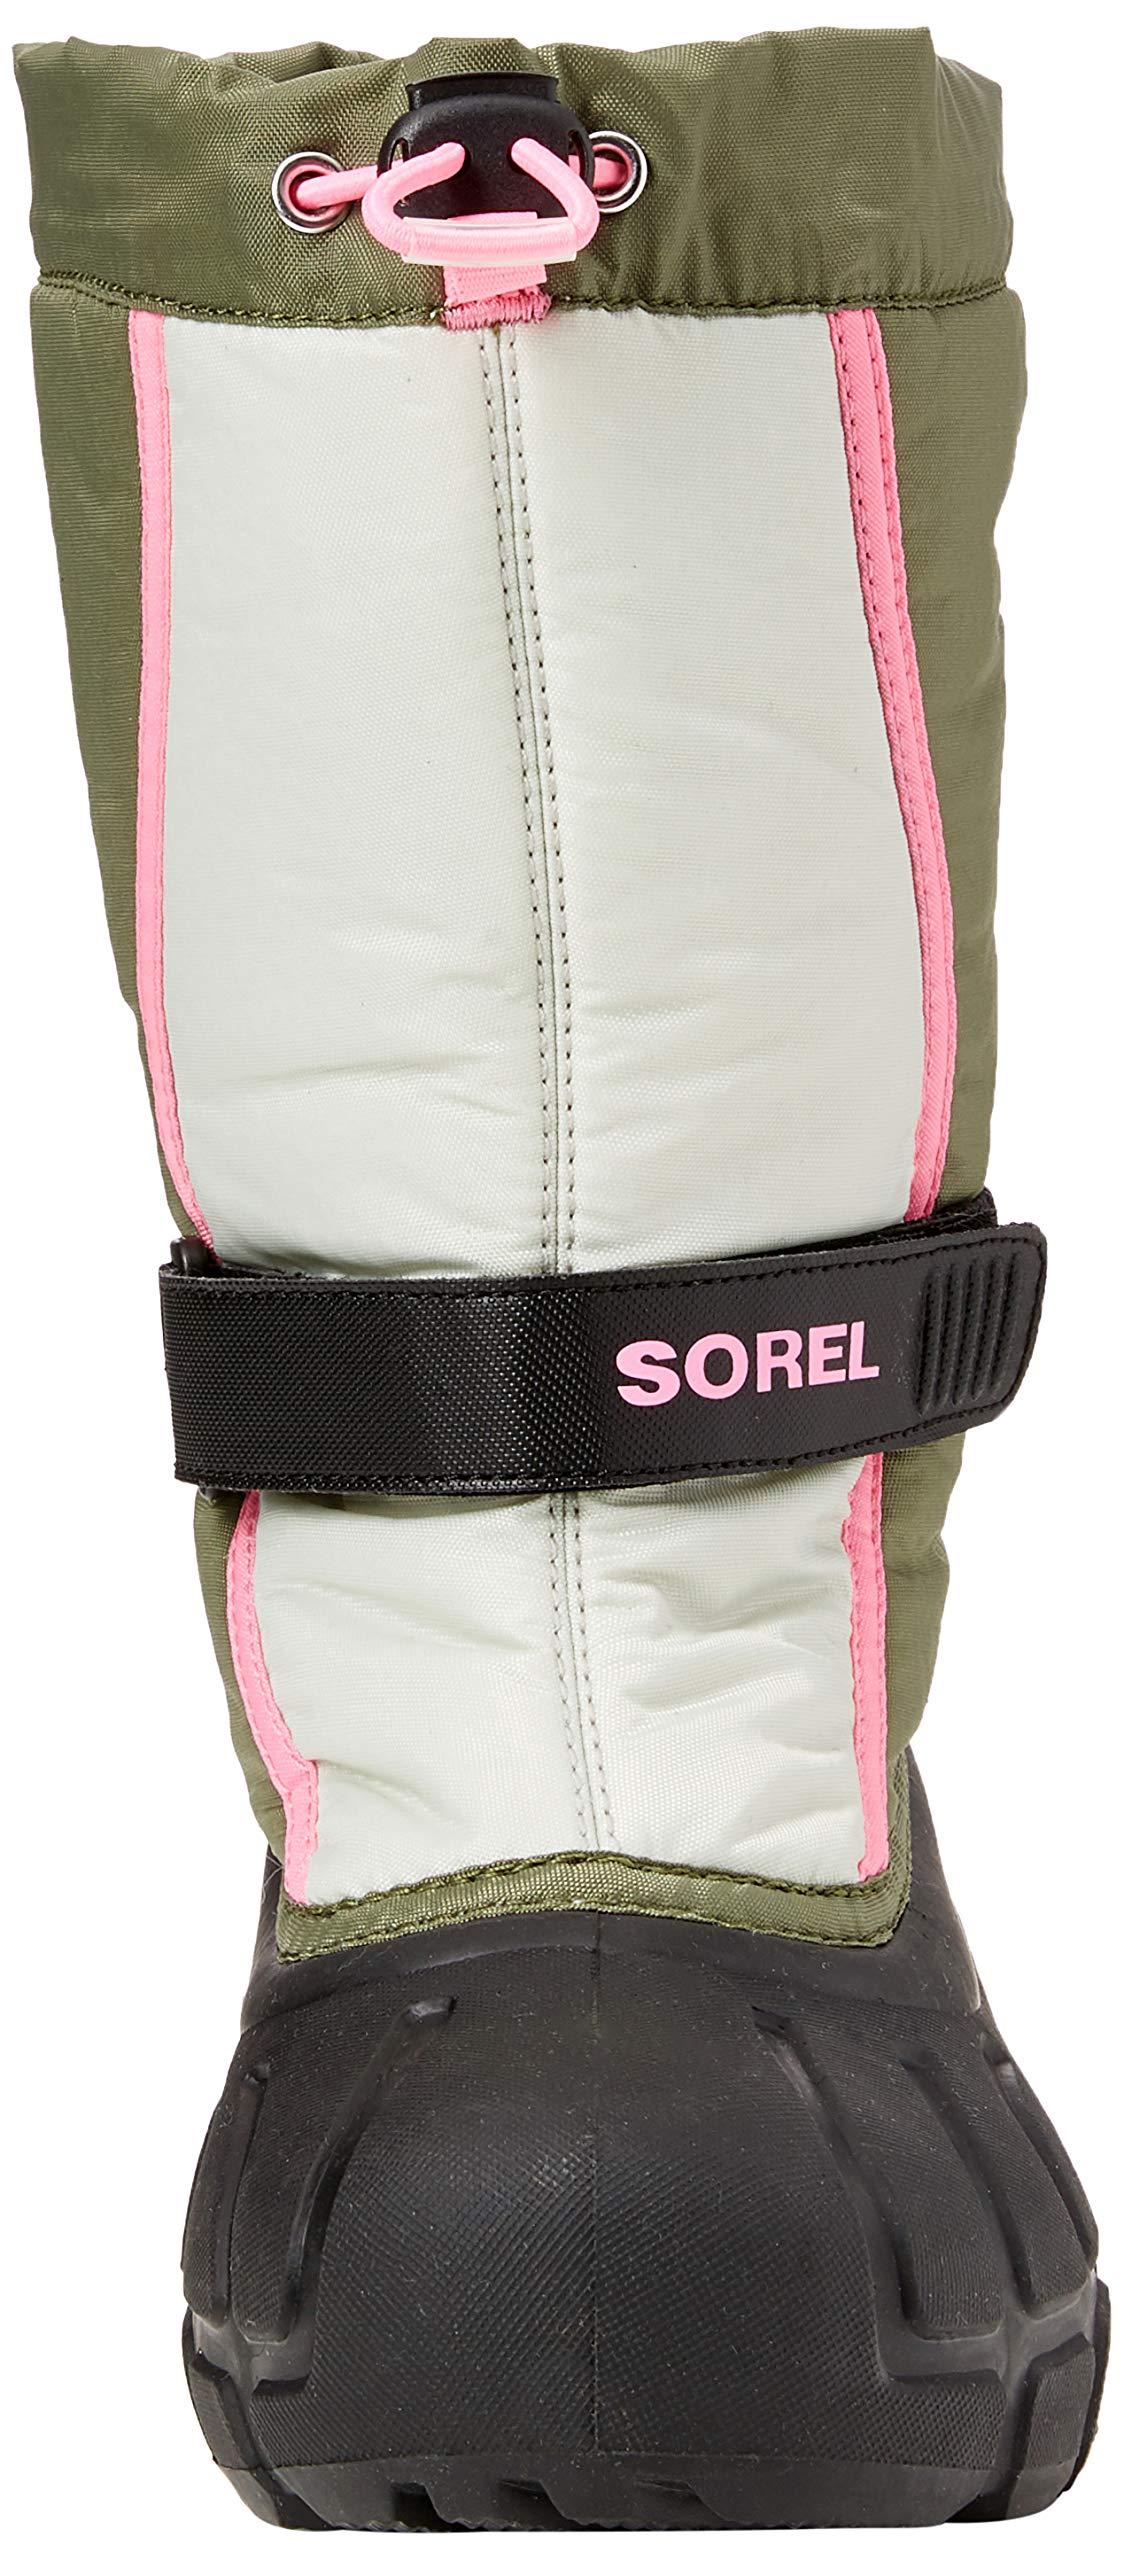 Sorel Girls' Youth Flurry Snow Boot, Hiker Green, Bubblegum, 5 M US Big Kid by Sorel (Image #4)